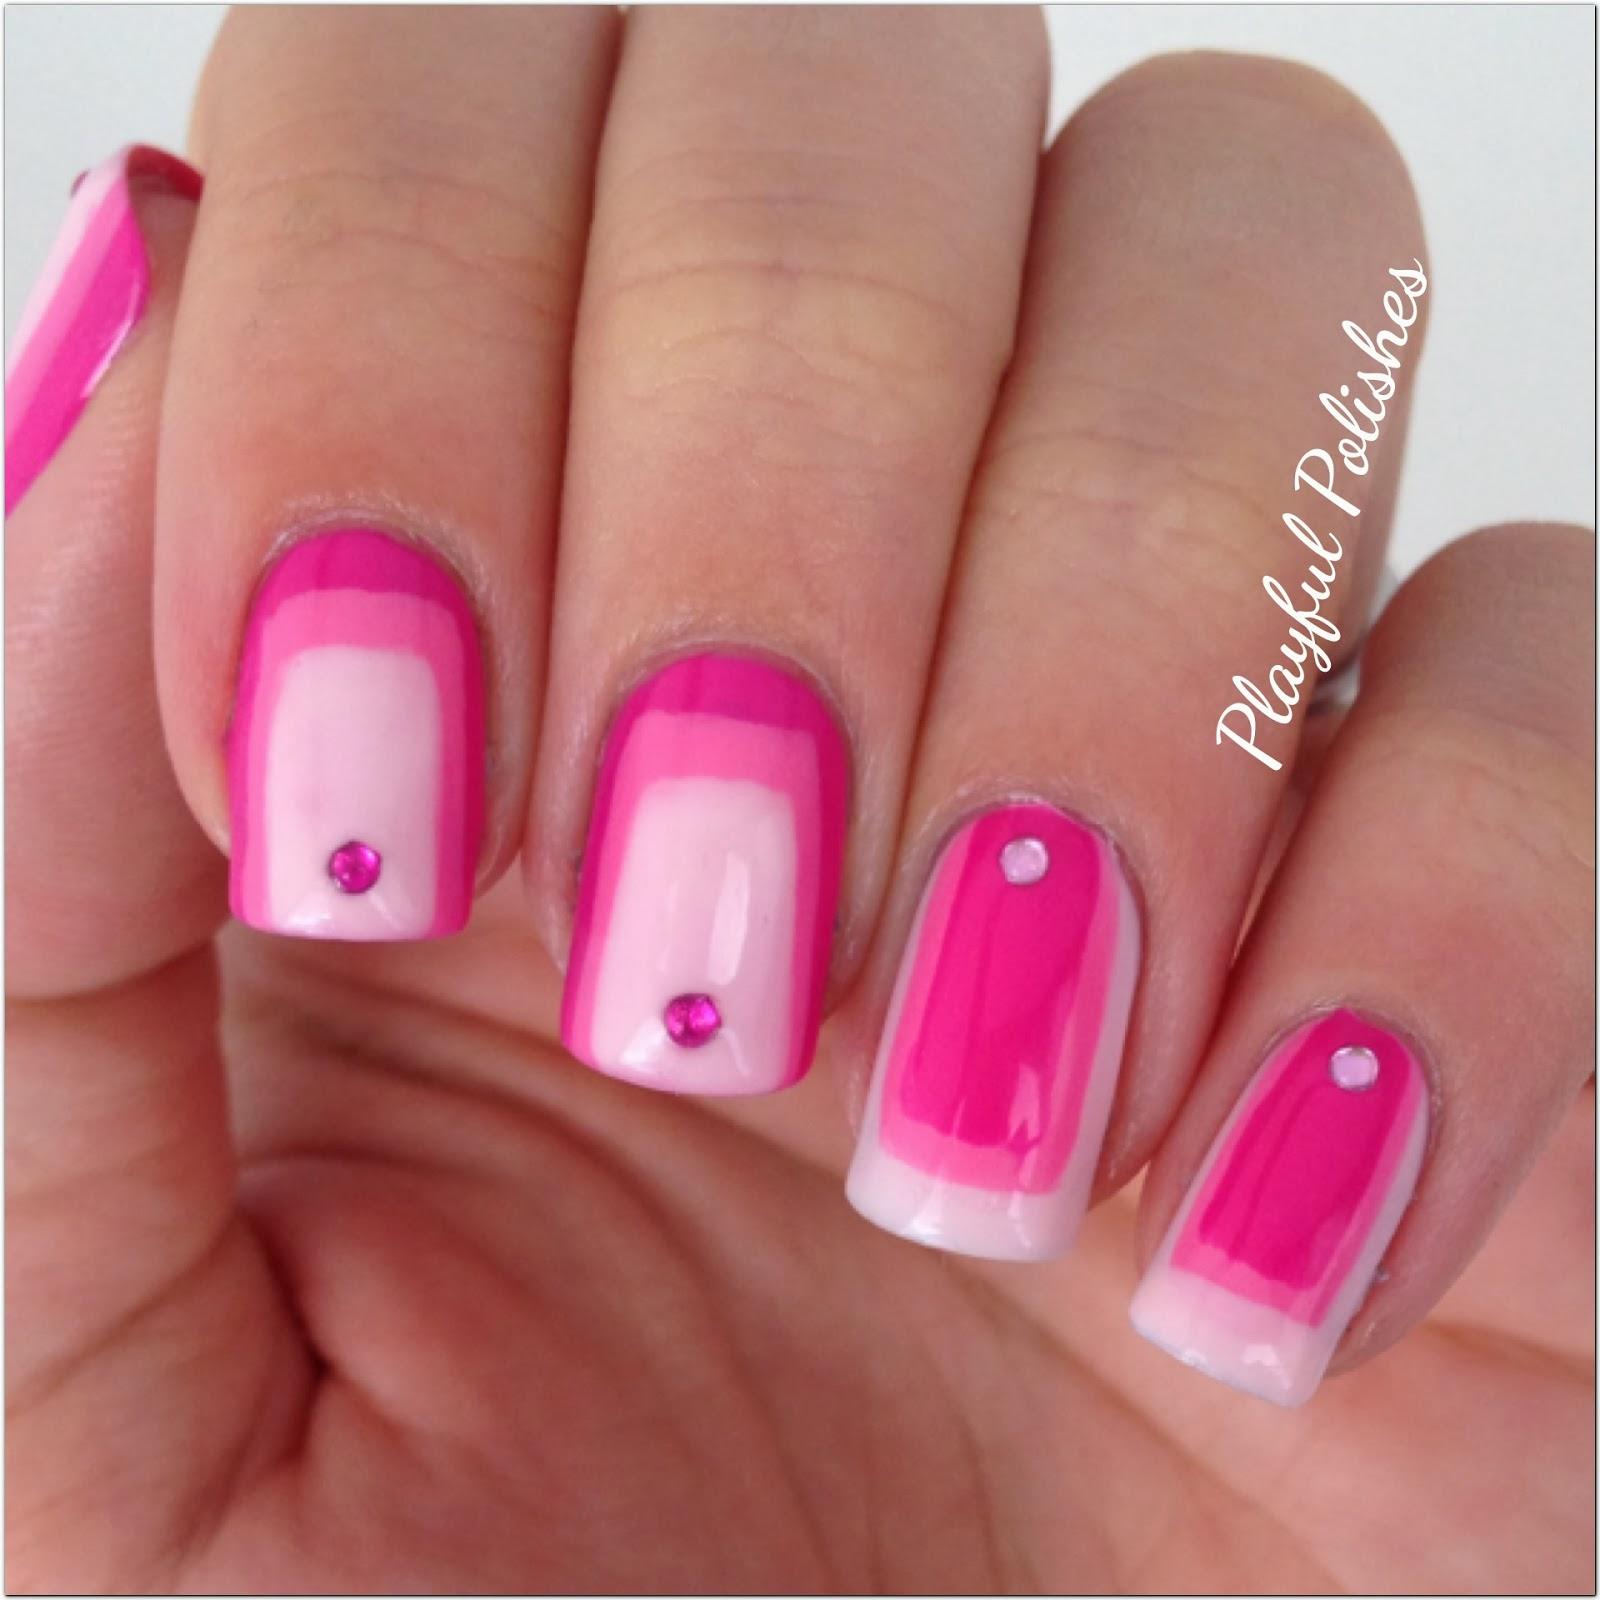 Gradient Nail Art: Playful Polishes: 31 DAY NAIL ART CHALLENGE: GRADIENT NAILS